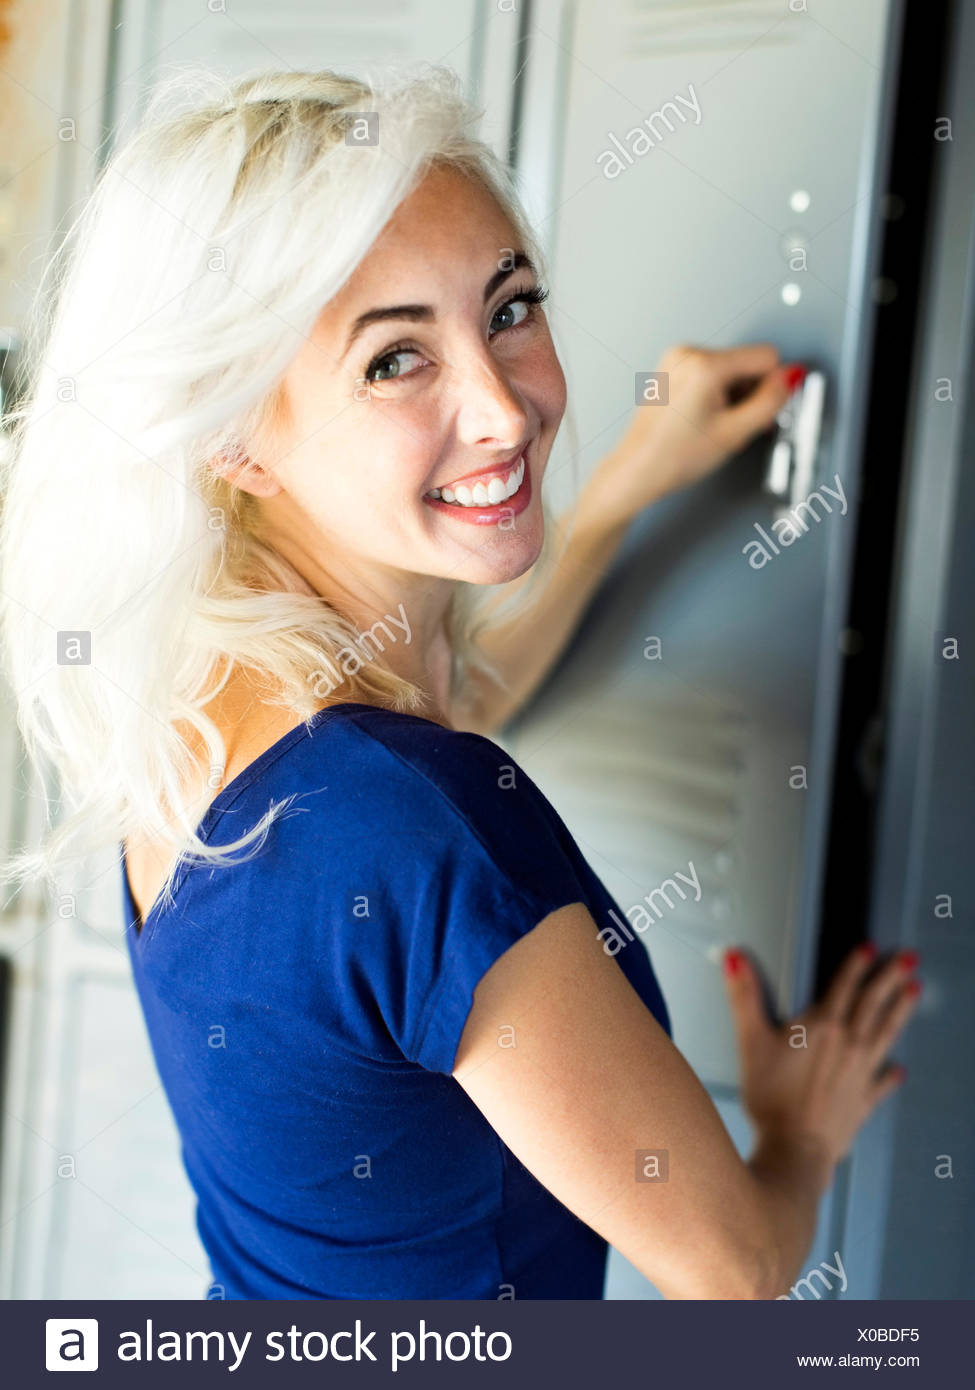 Mujer locker de apertura Imagen De Stock